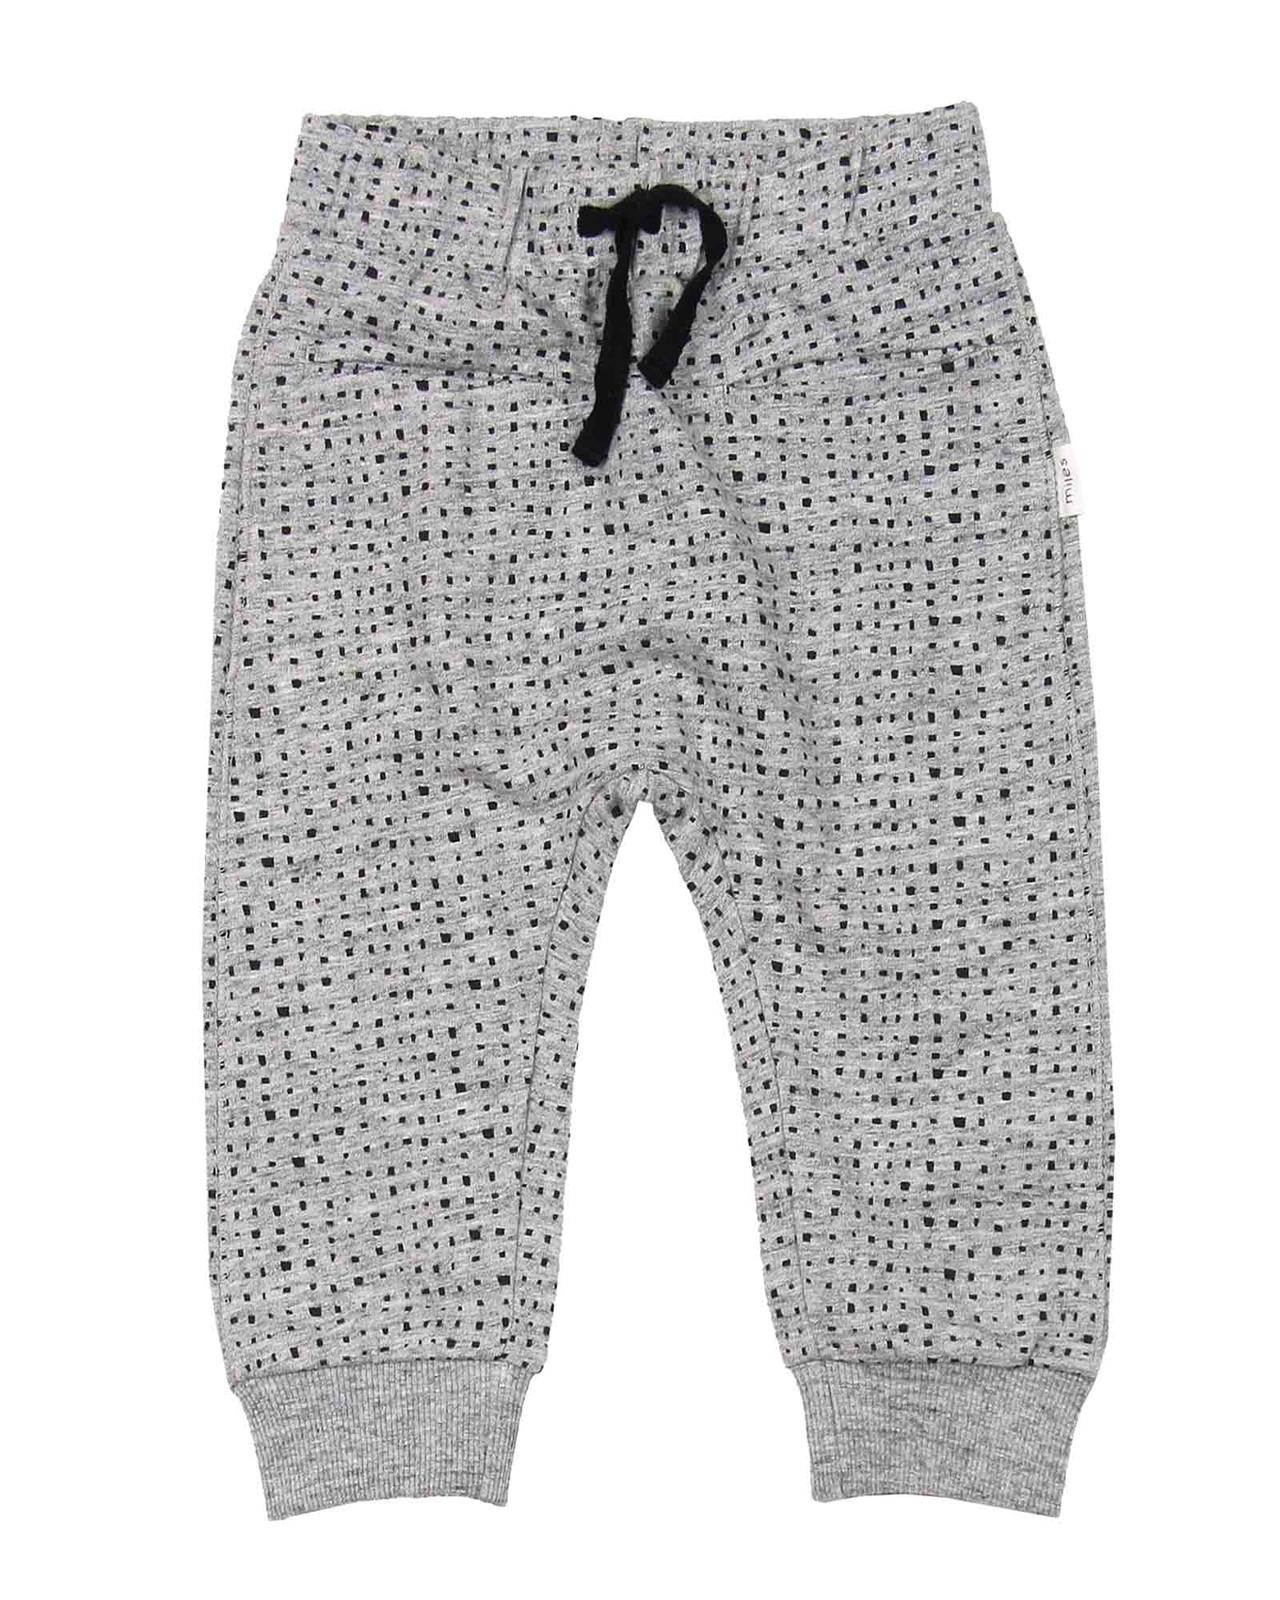 5b8b65bb Miles Baby Boys Sweatpants in Blocks Print - Miles Baby Spring ...